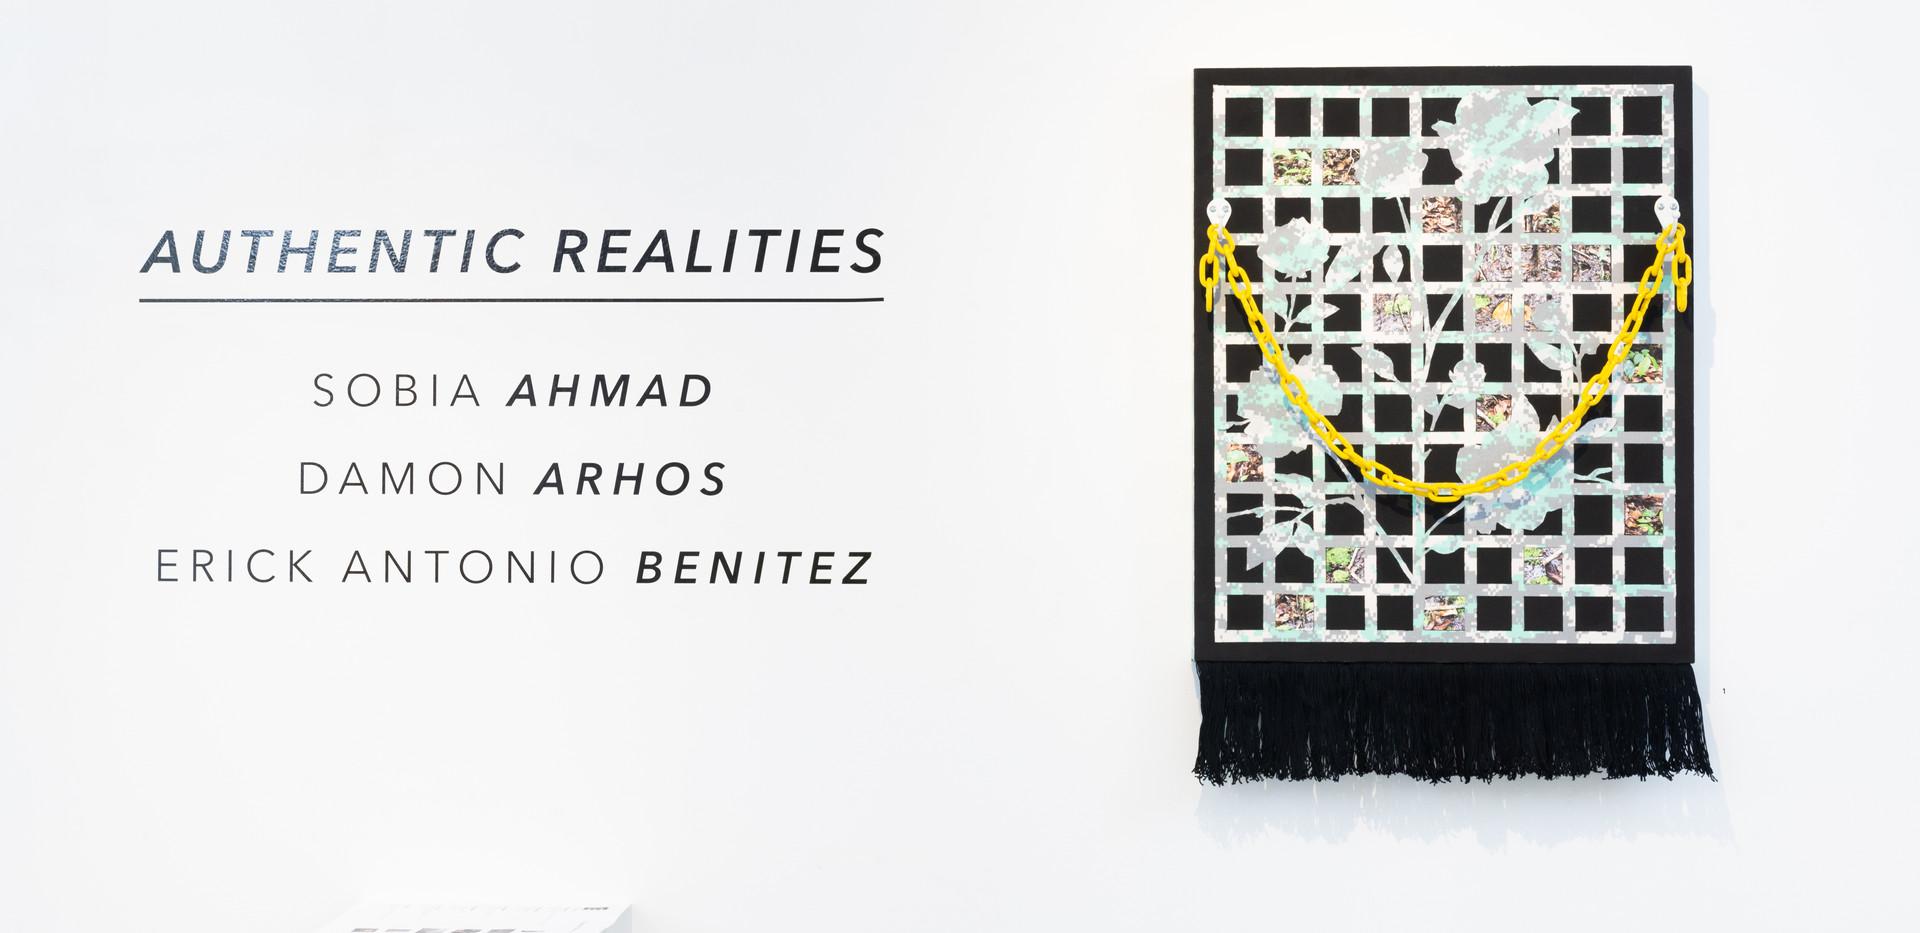 """Sigil #3"" by Erick Antonio Benitez"